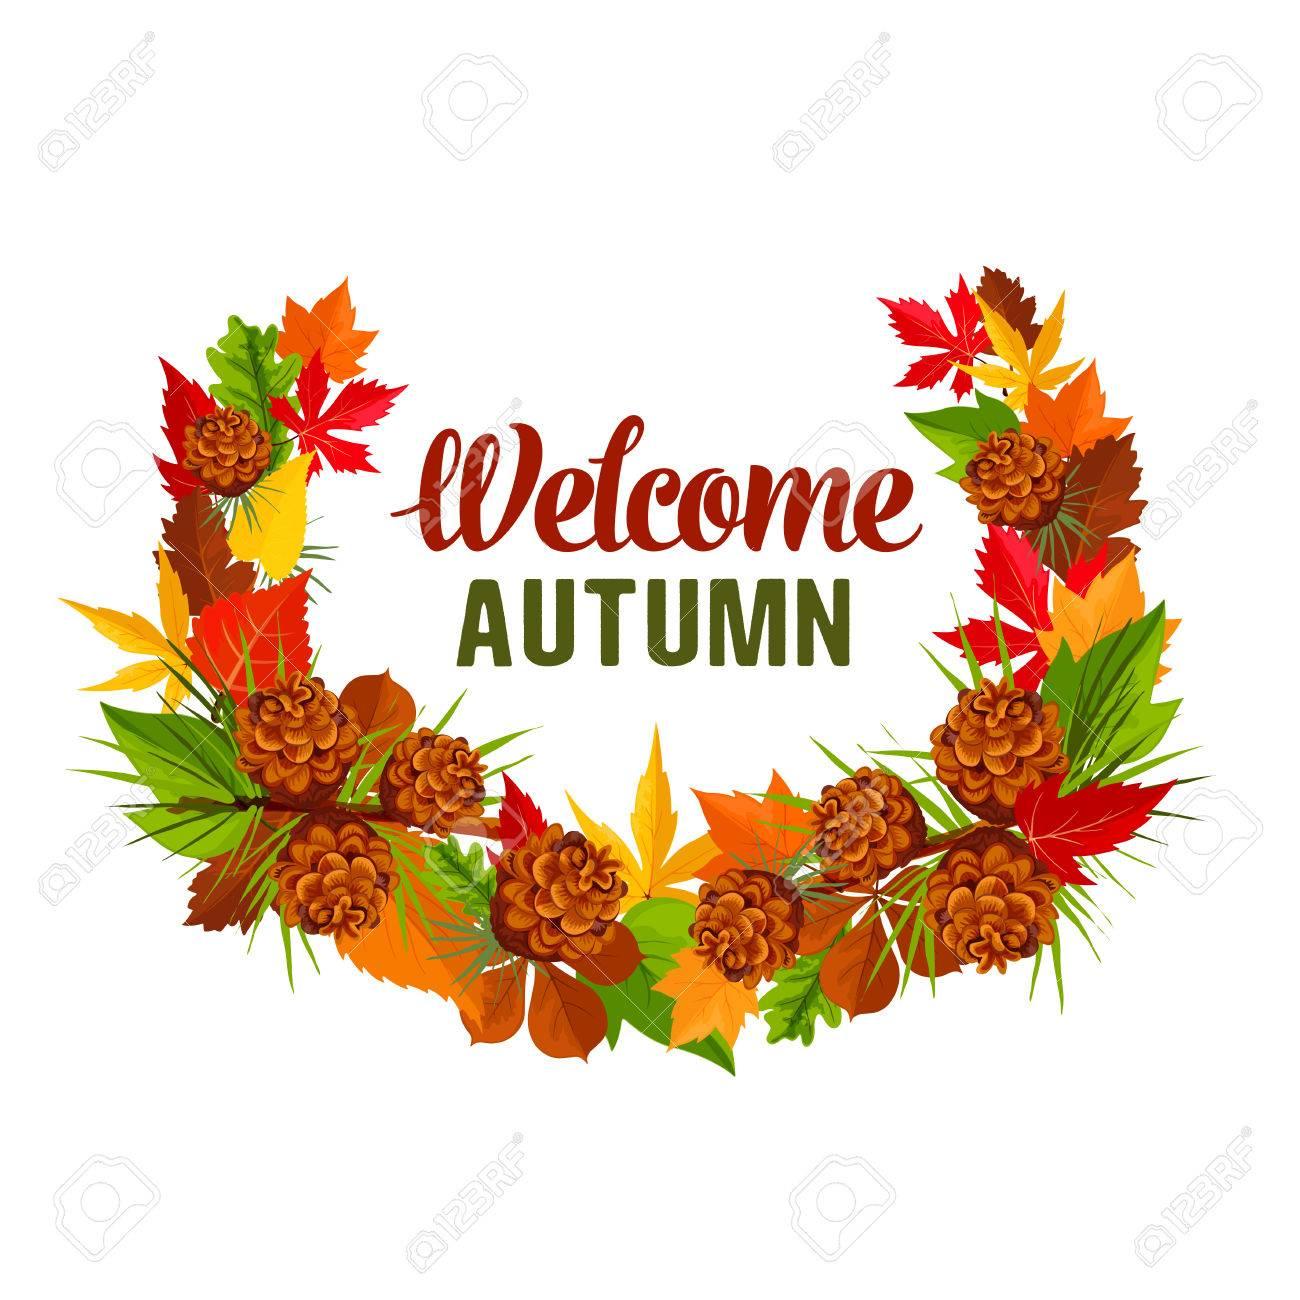 Welcome autumn seasonal greeting card of foliage wreath of pine welcome autumn seasonal greeting card of foliage wreath of pine or fir tree cone poplar kristyandbryce Choice Image